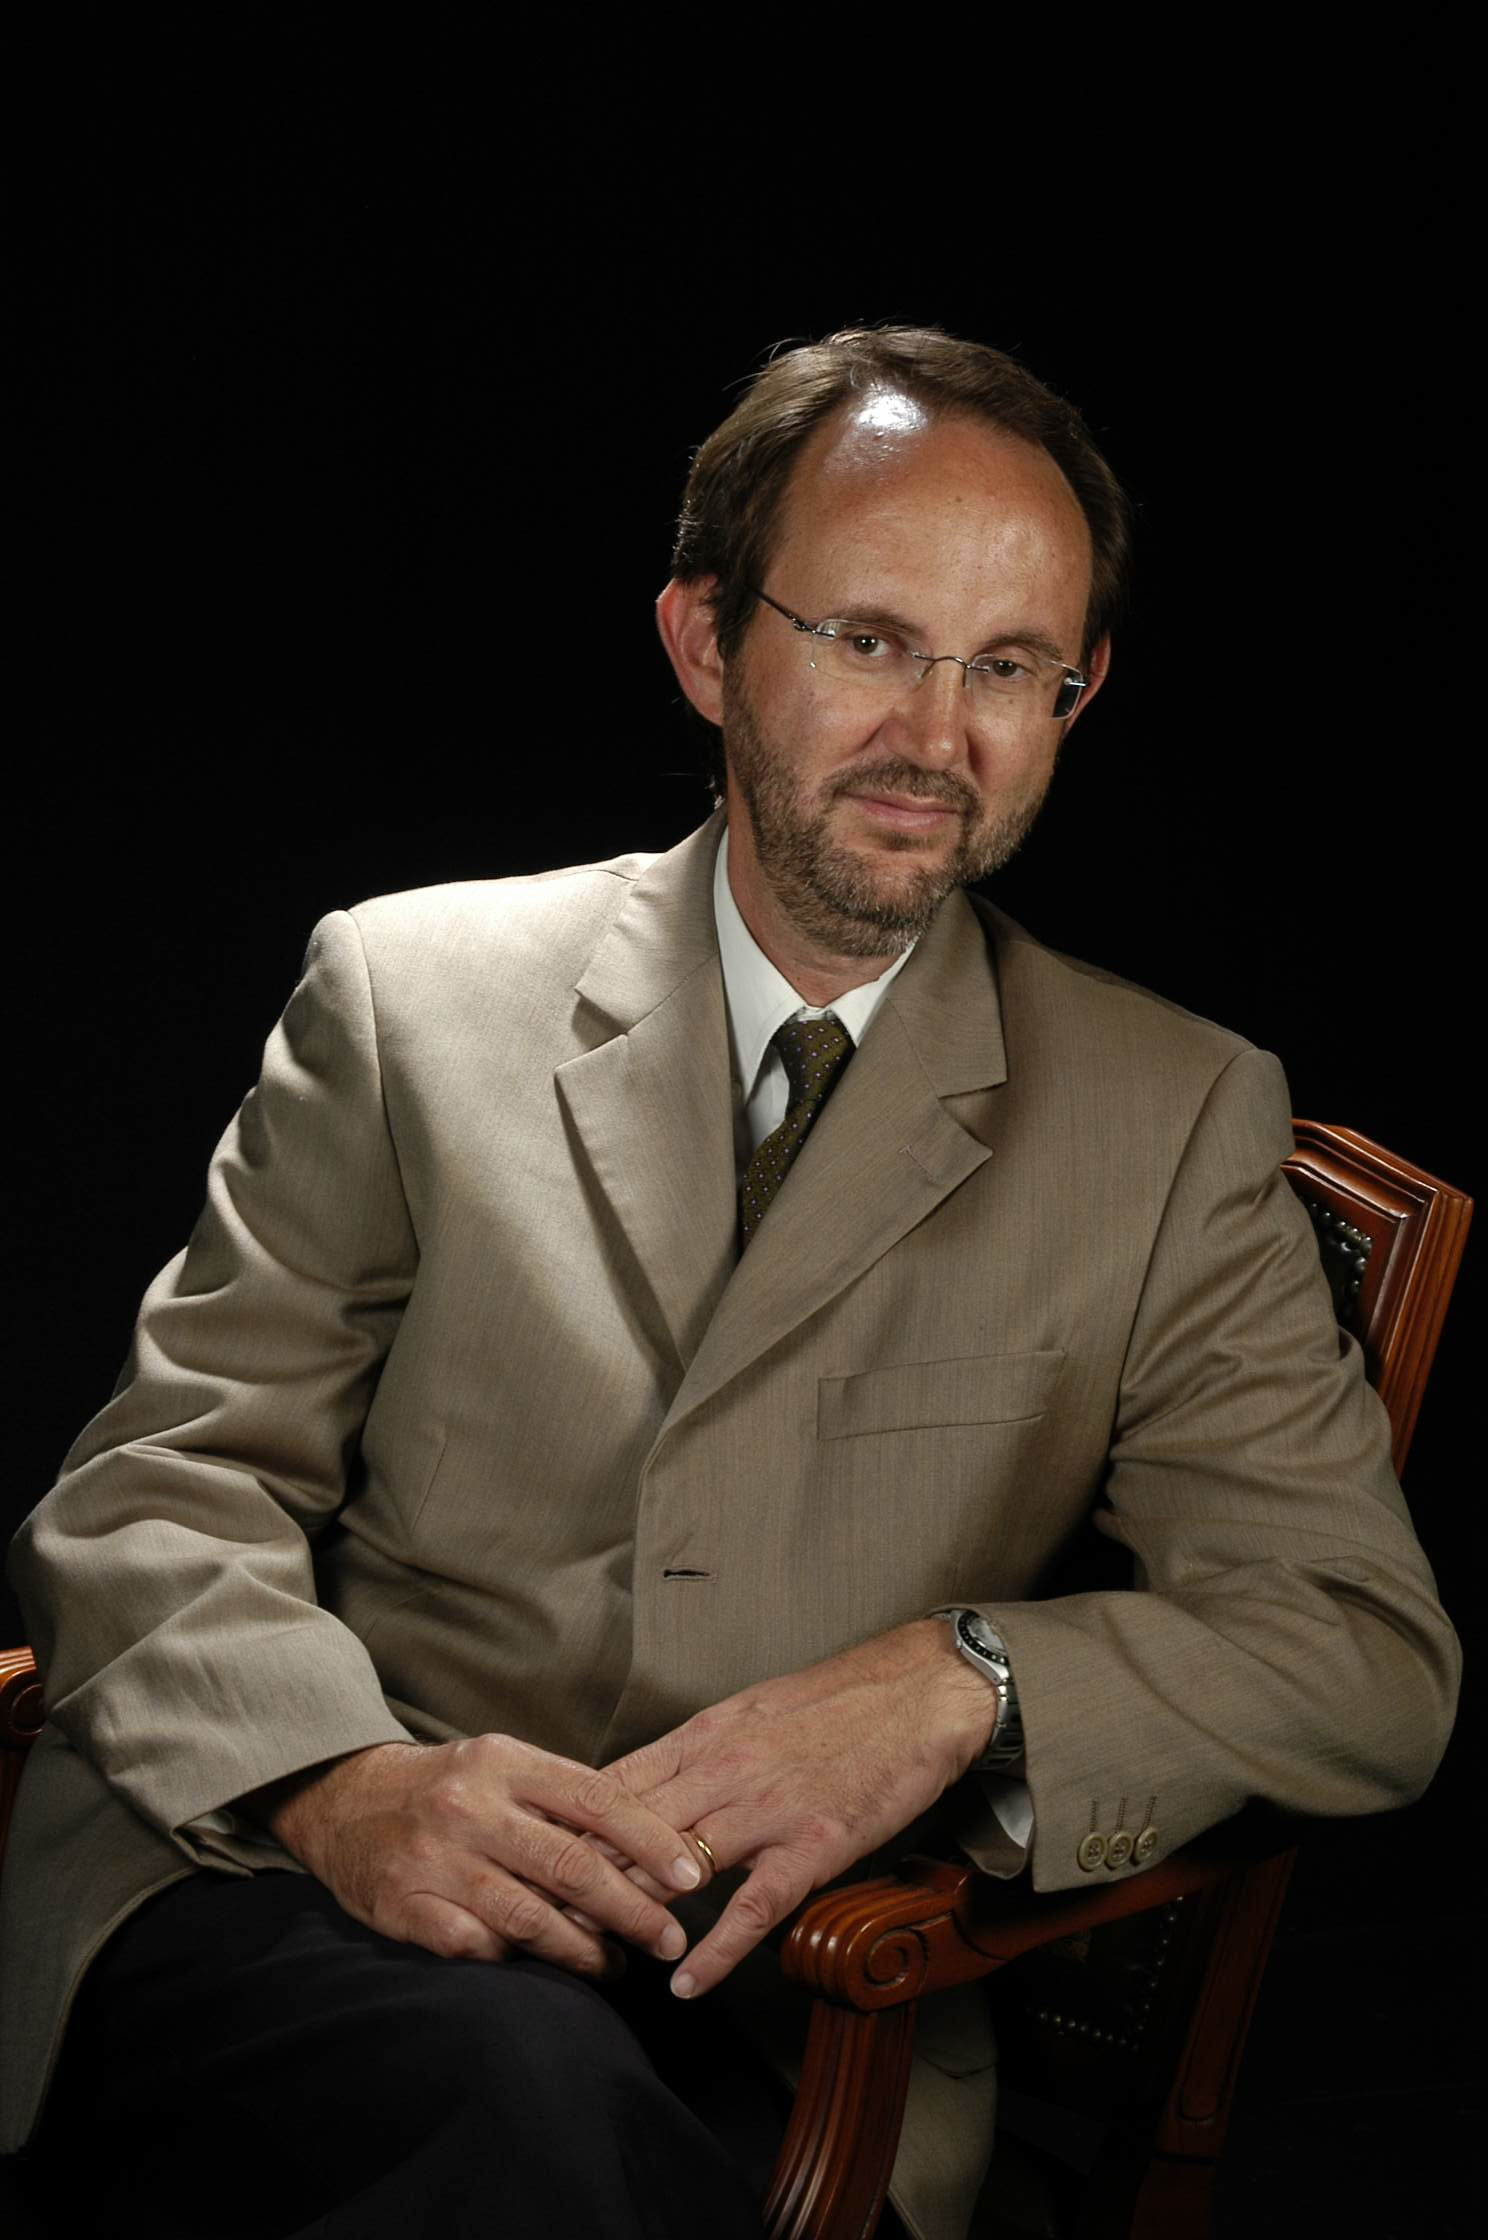 Dr. Jordi Sierra Gil